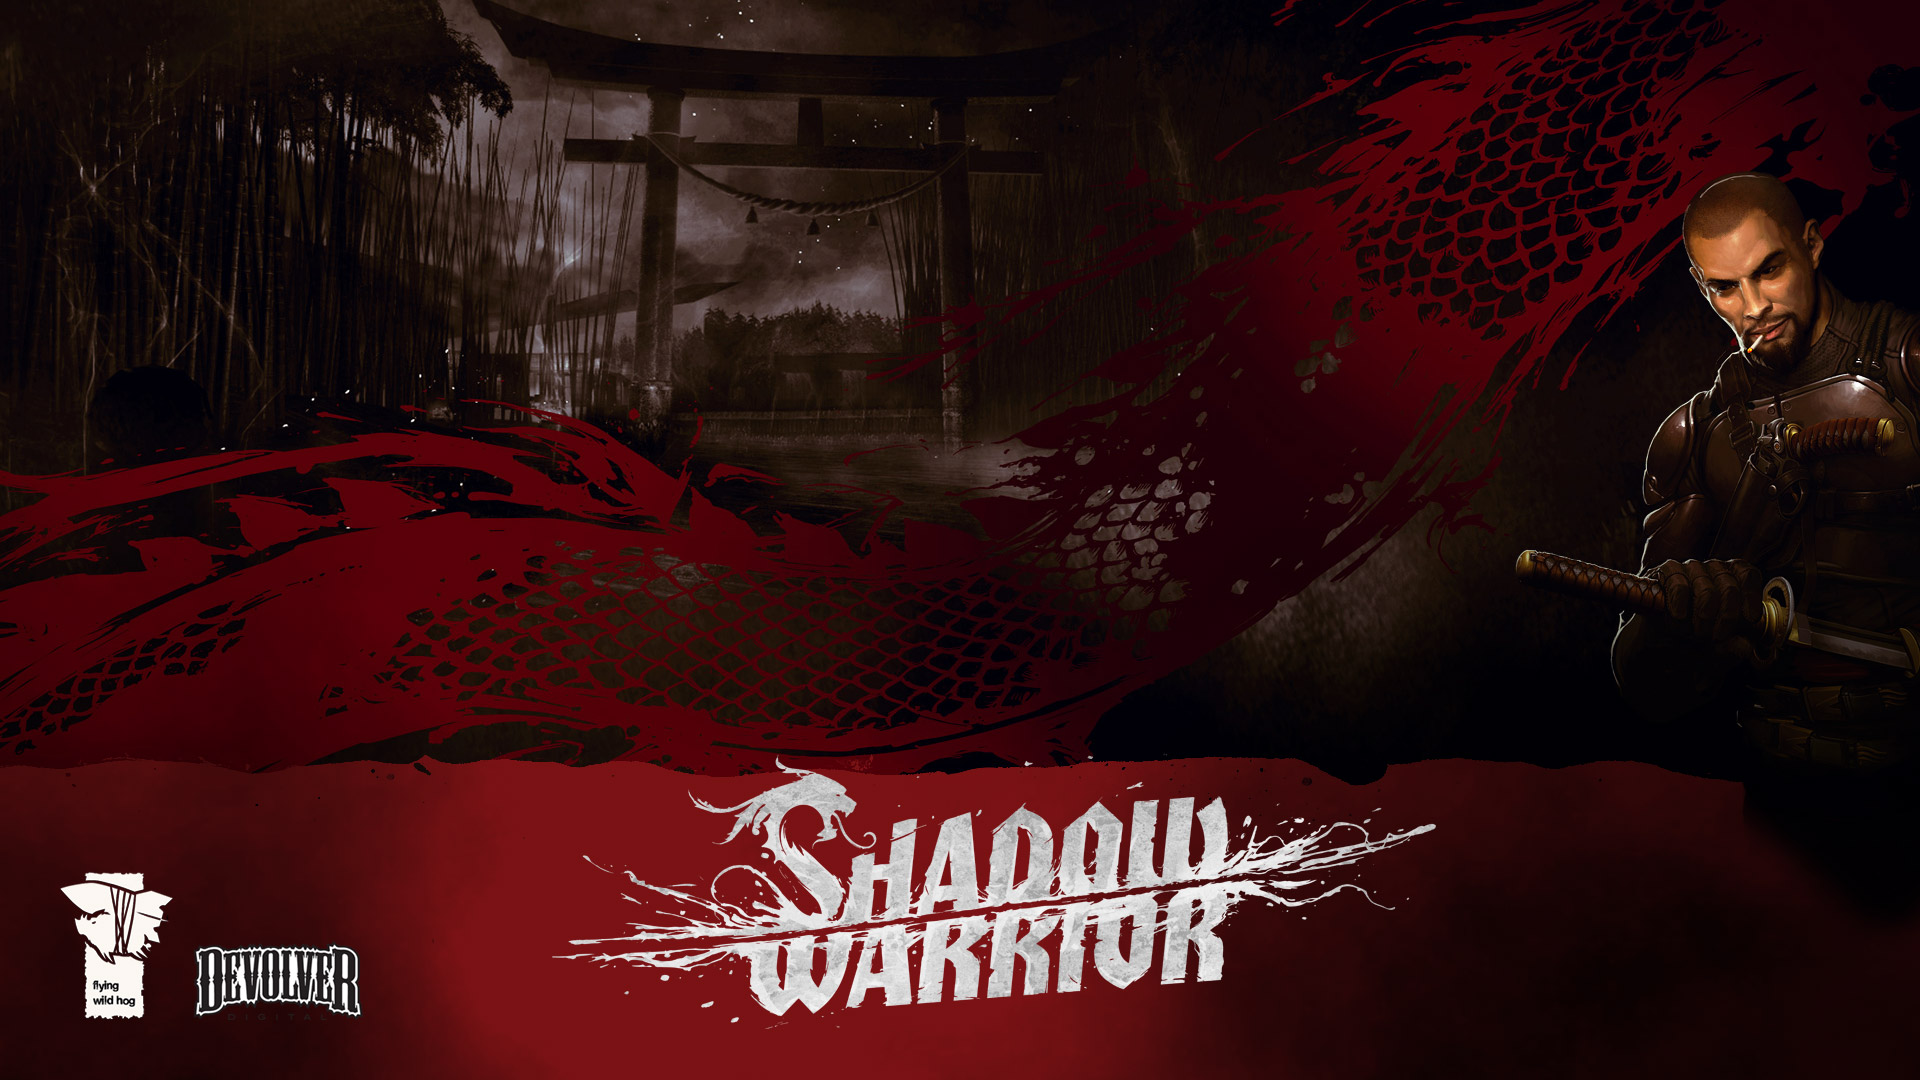 Free Shadow Warrior Wallpaper in 1920x1080